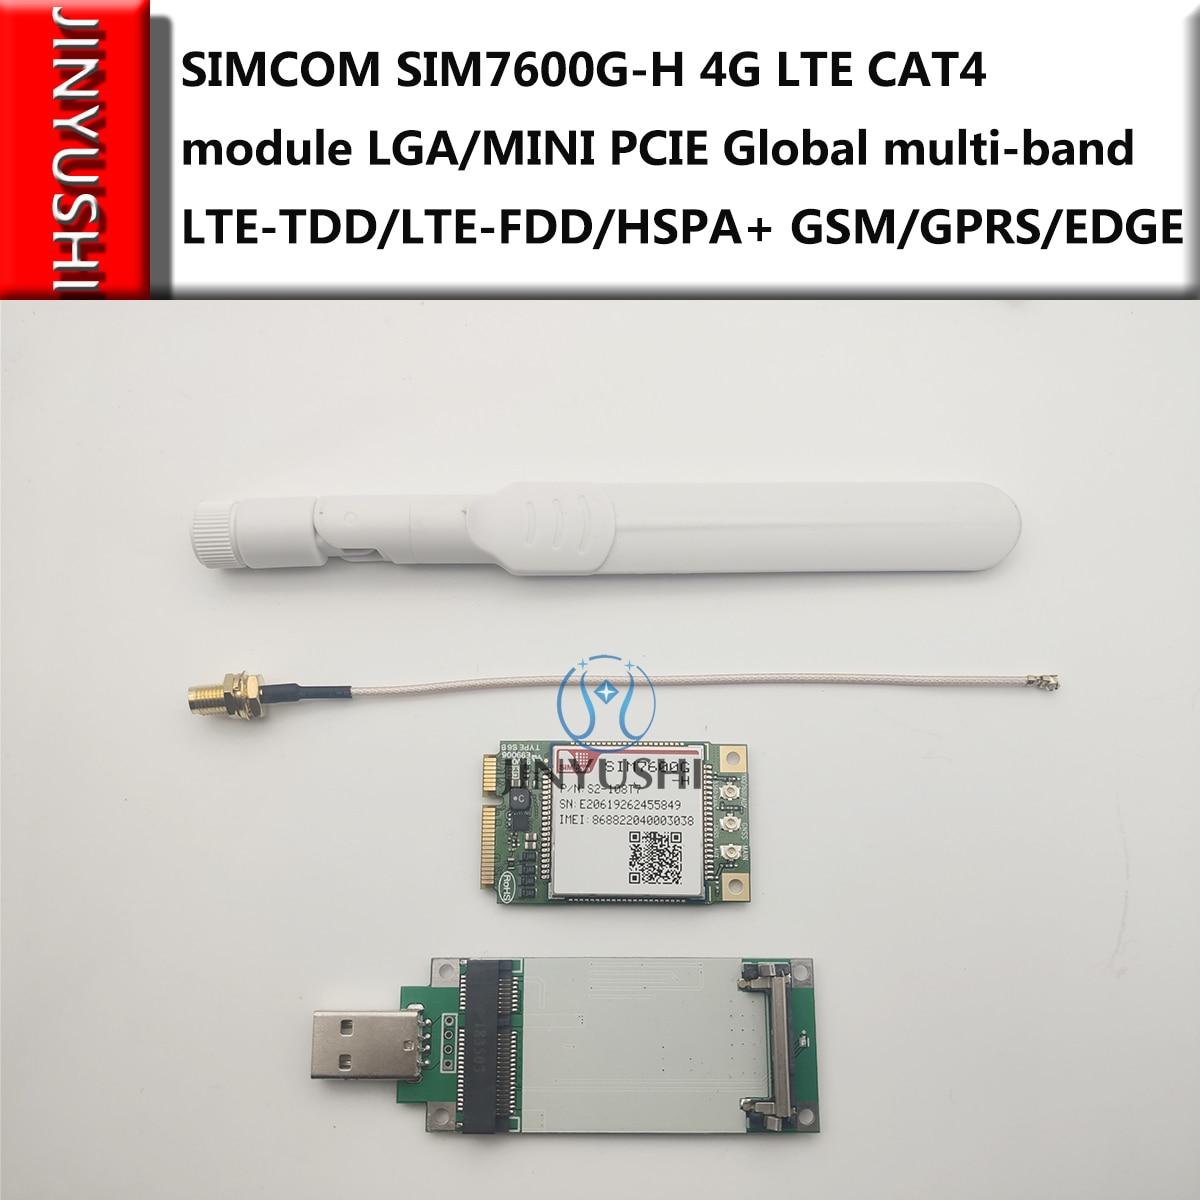 New! SIMCOM SIM7600G-H SIM7600G 4G LTE CAT4 Module LGA/MINI PCIE Global Worldwide Multi-band LTE-TDD/LTE-FDD/HSPA+ GSM/GPRS/EDGE